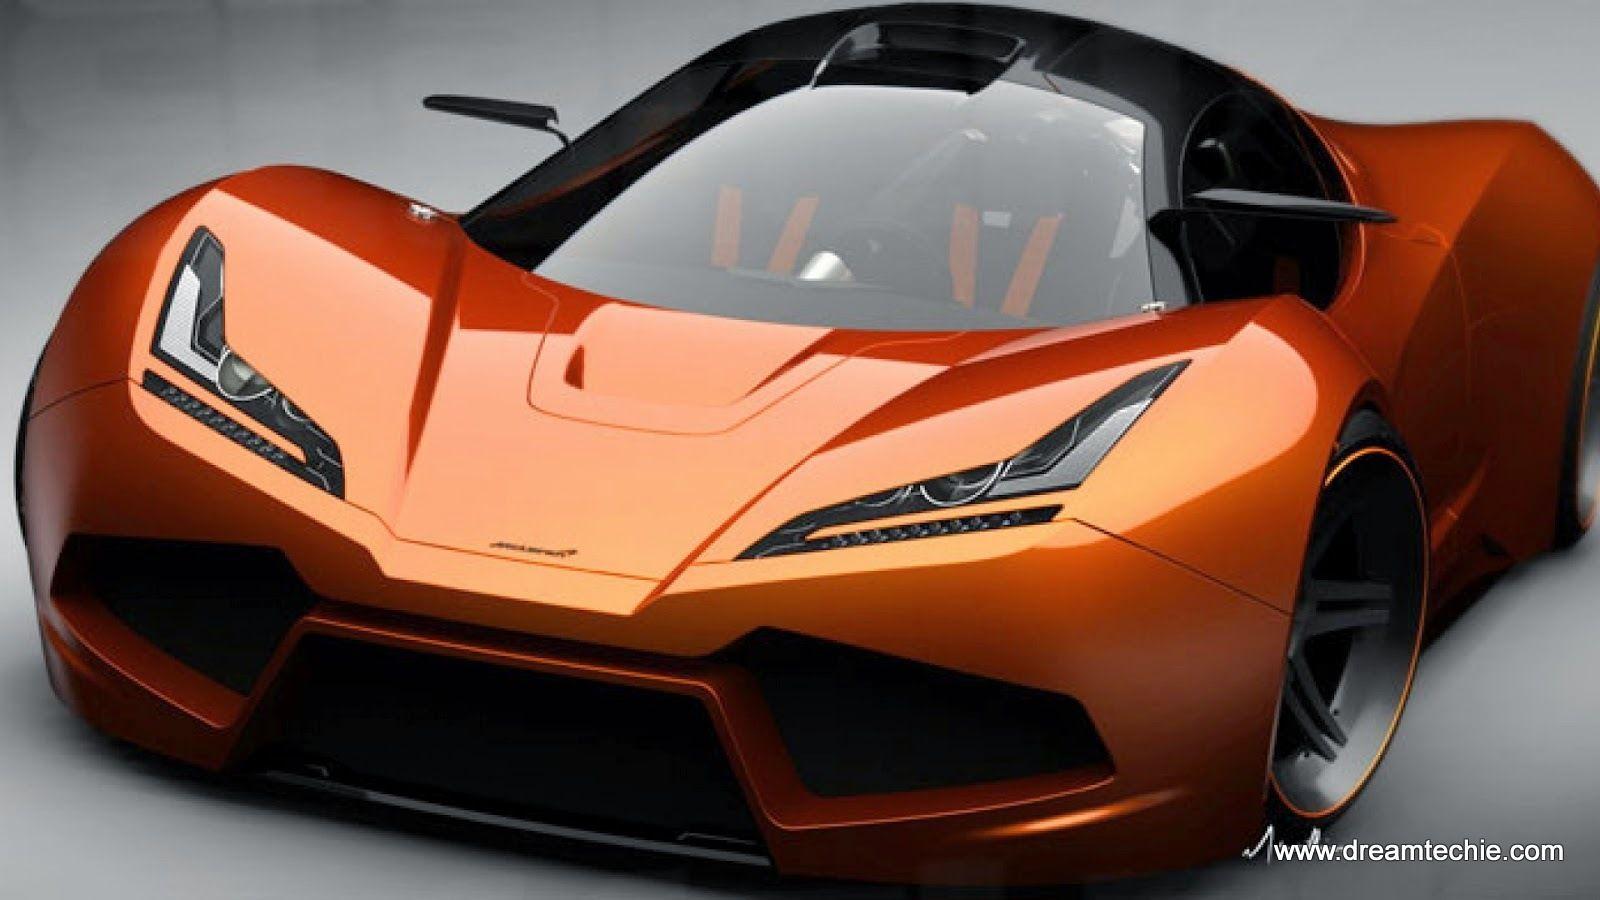 Luxury Cars Wallpaper For Your Desktop Best Luxury Cars Luxury Cars Luxury Coolest cars in world wallpaper 2015 hd